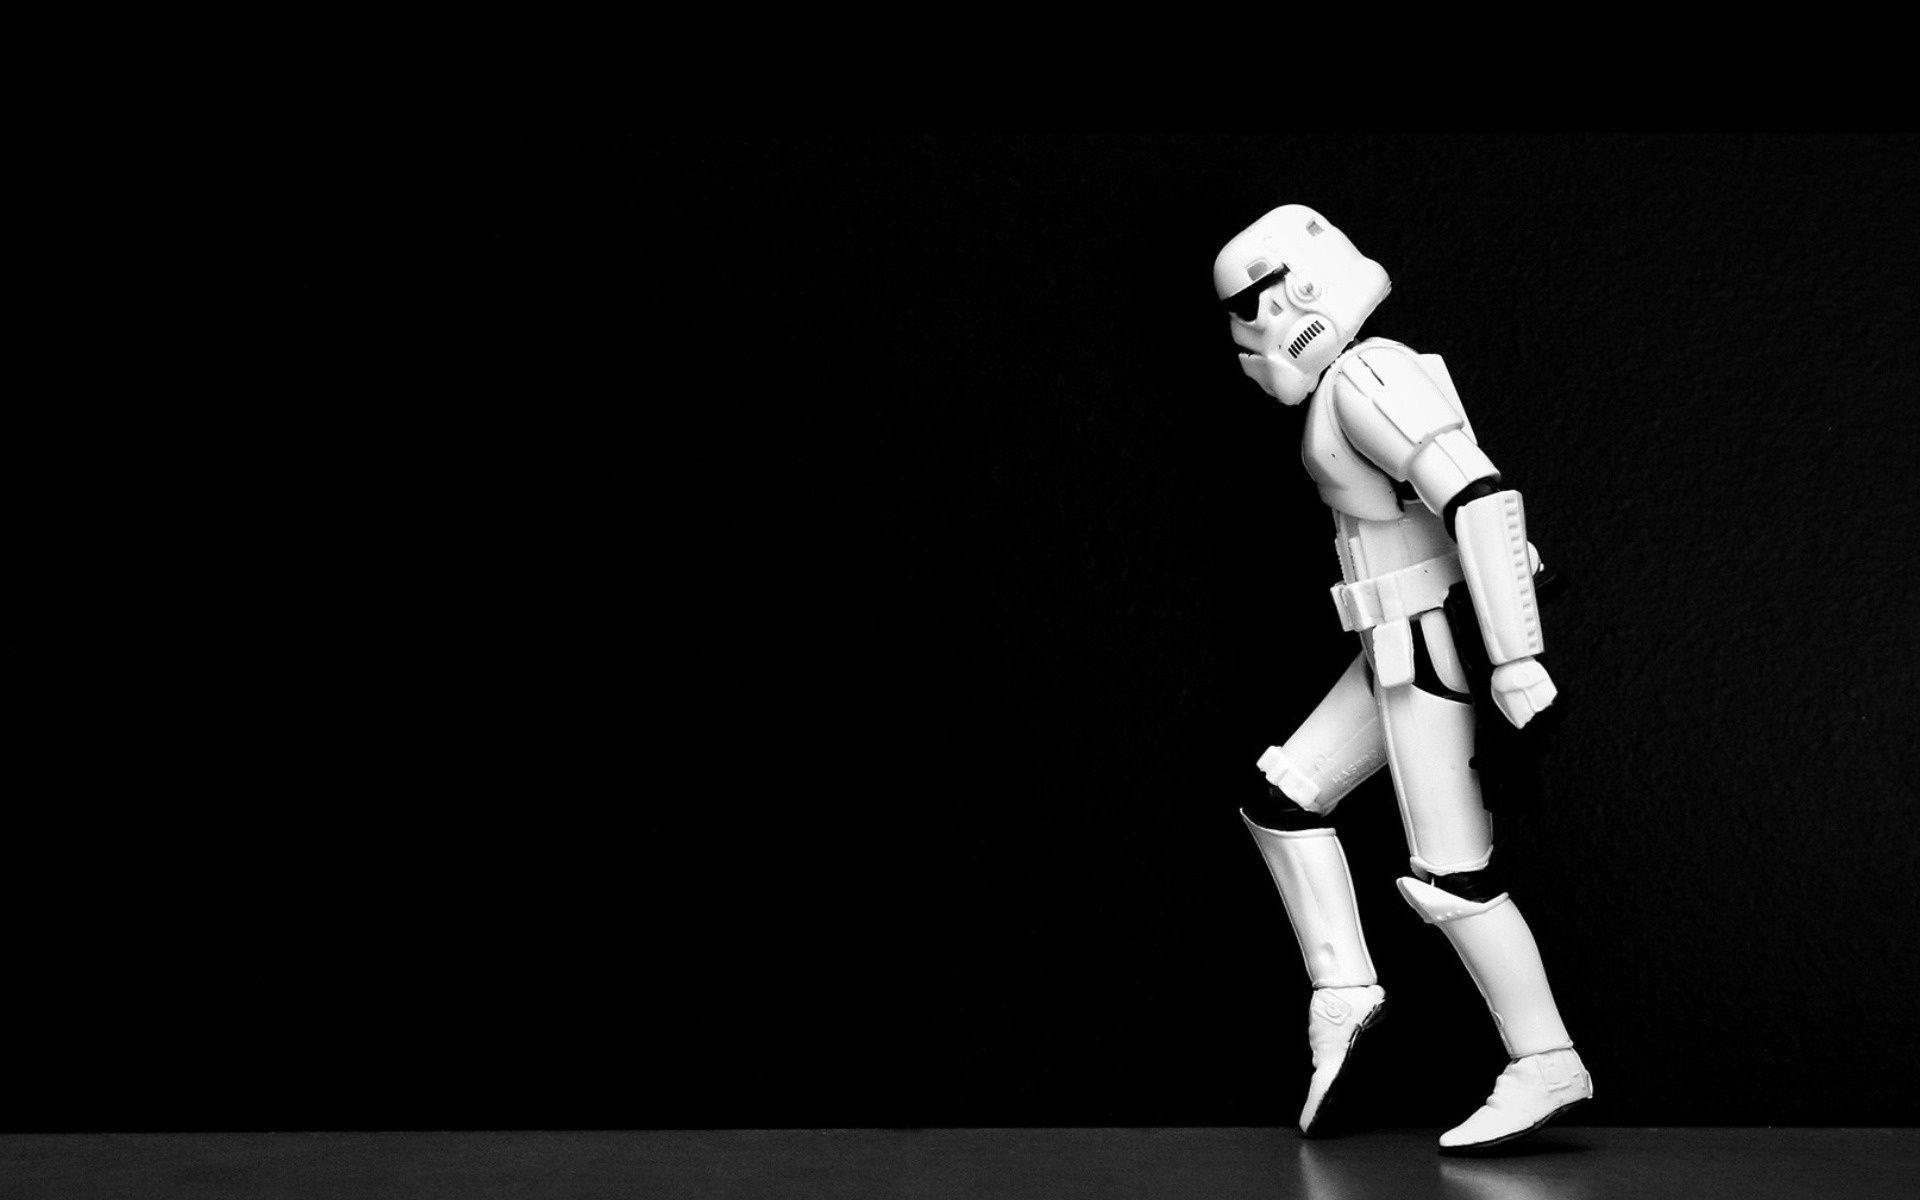 Clone Trooper wallpaper – 1172308